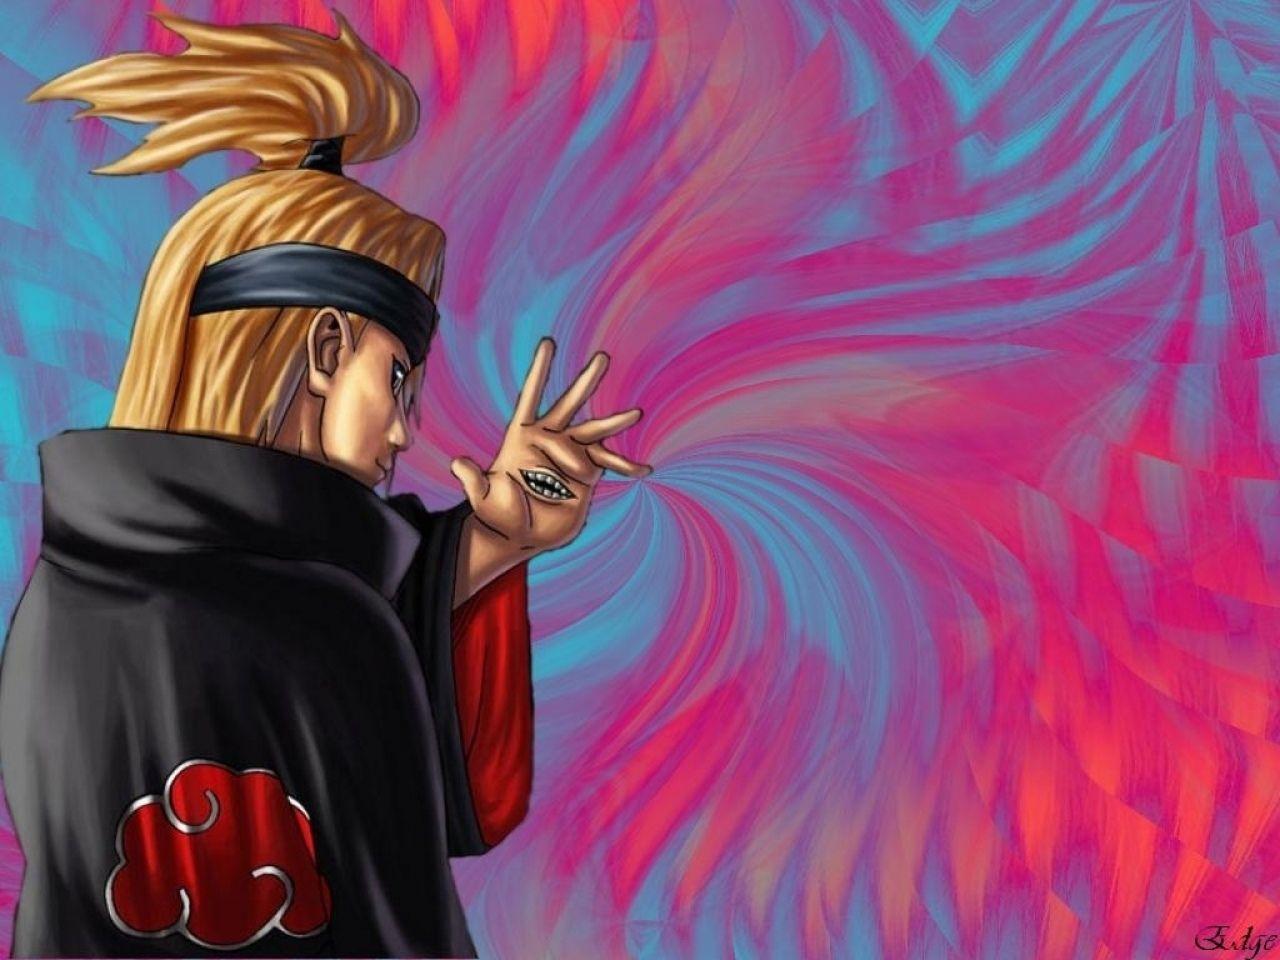 Good Wallpaper Naruto Akatsuki - 0d4e3133e69f755c6d390ca0b35053db  Collection_74882.jpg